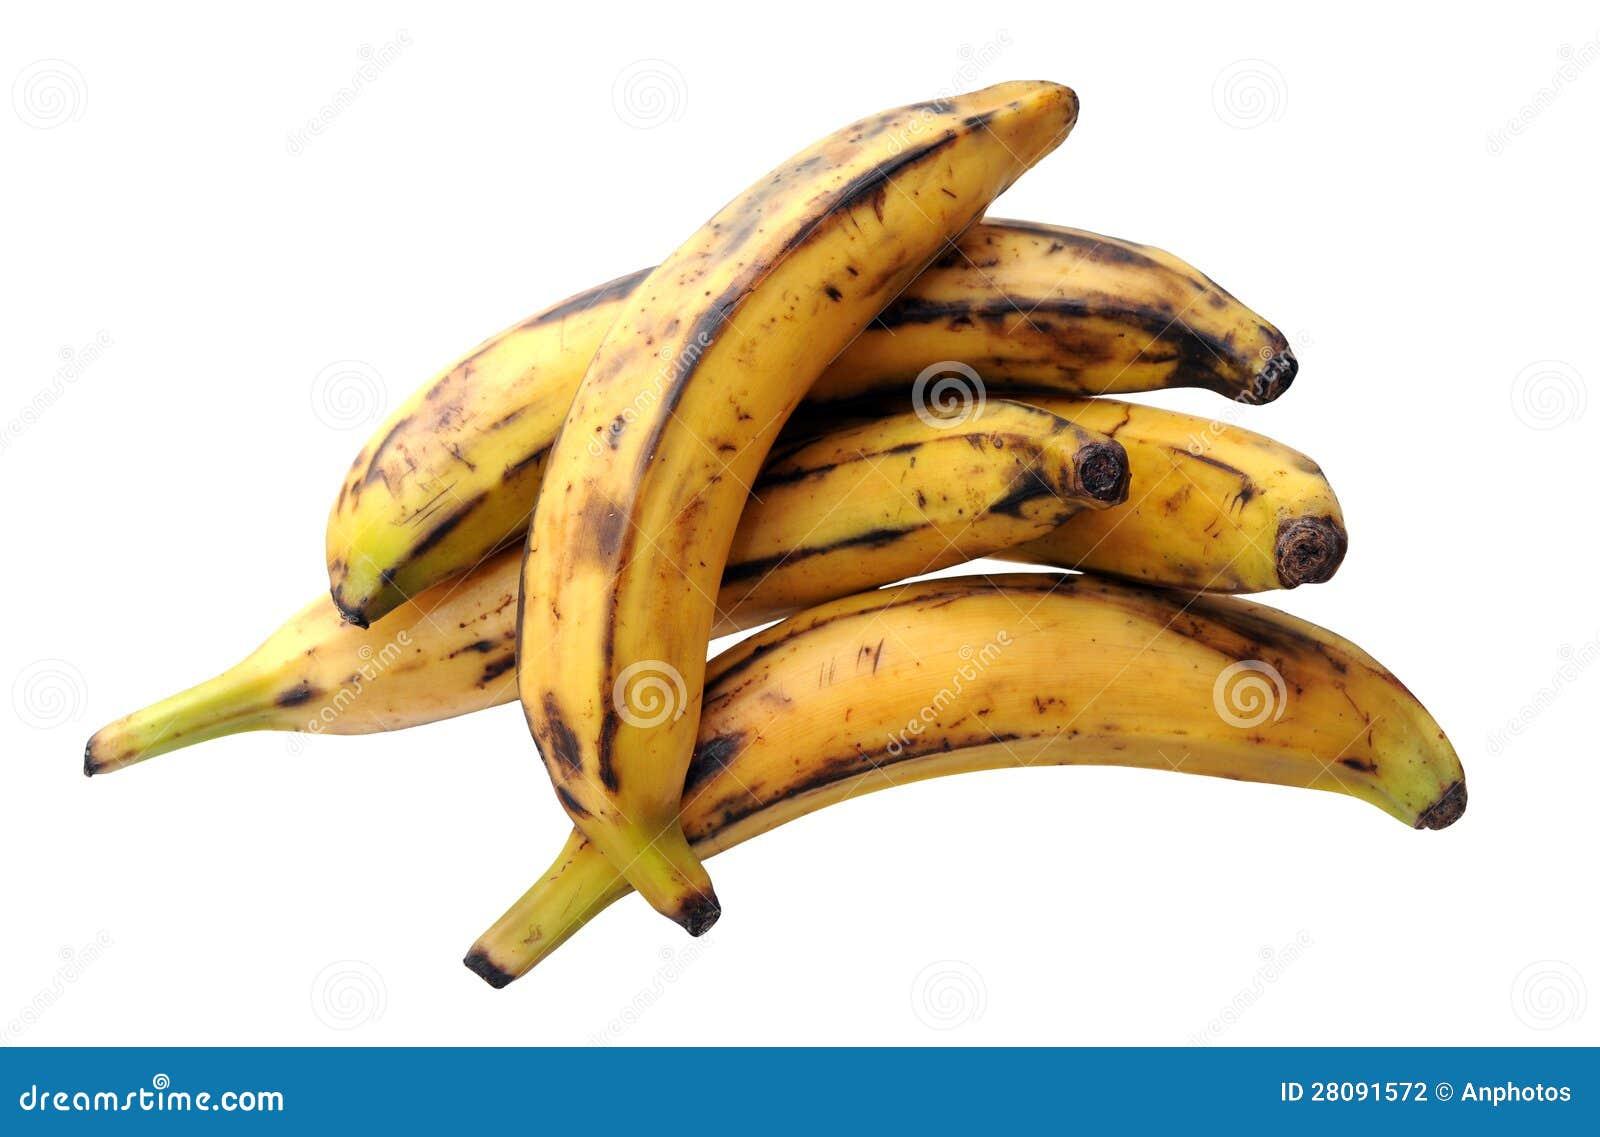 some ripe banana plantain stock photography image 28091572